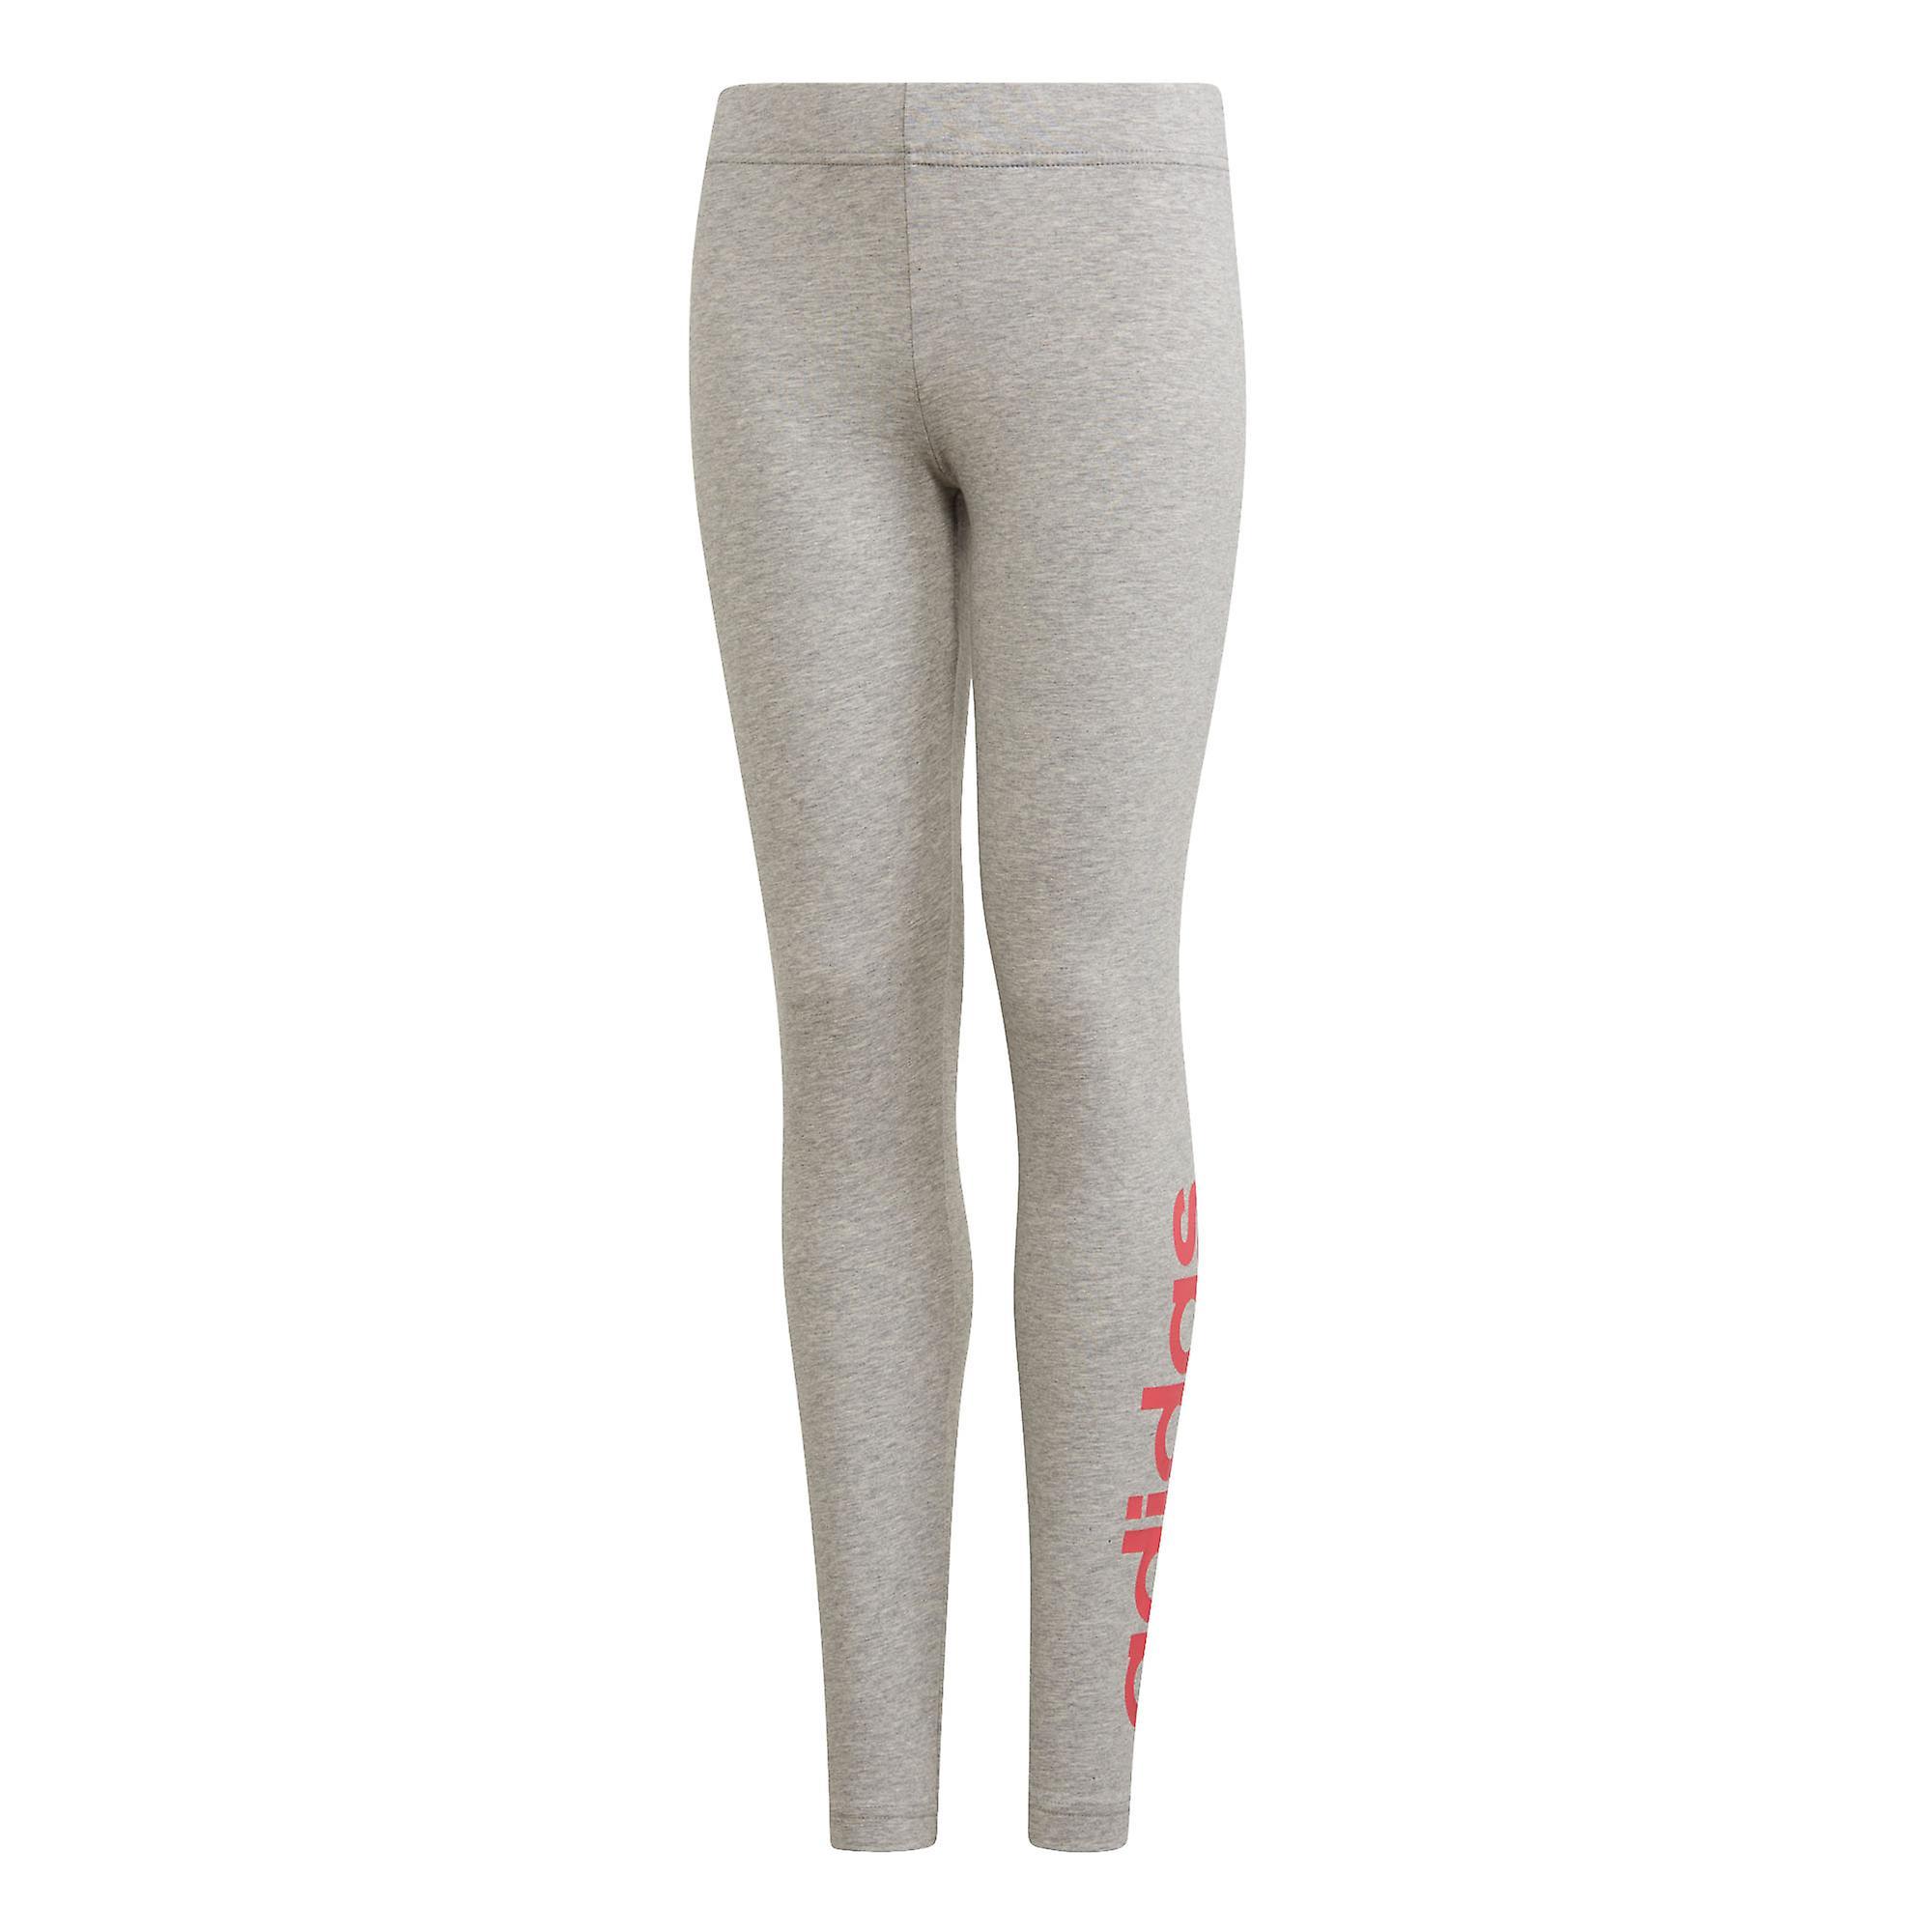 adidas Essentials Linear Girls Kids Sports Legging Tight Pant Grey